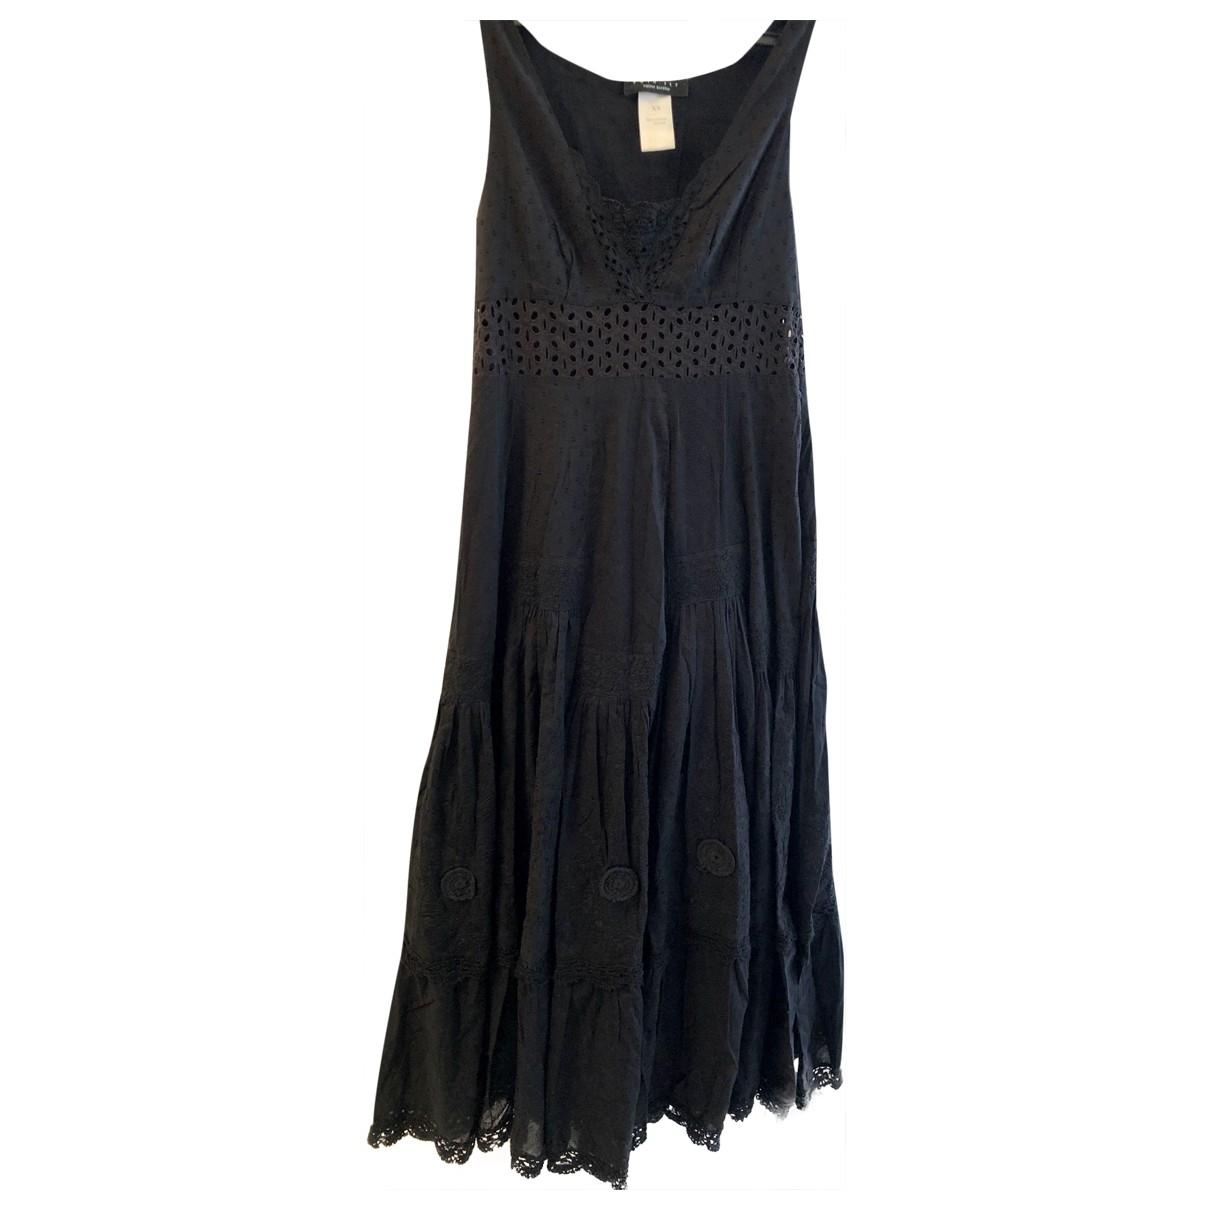 Twin Set \N Black Cotton dress for Women XS International